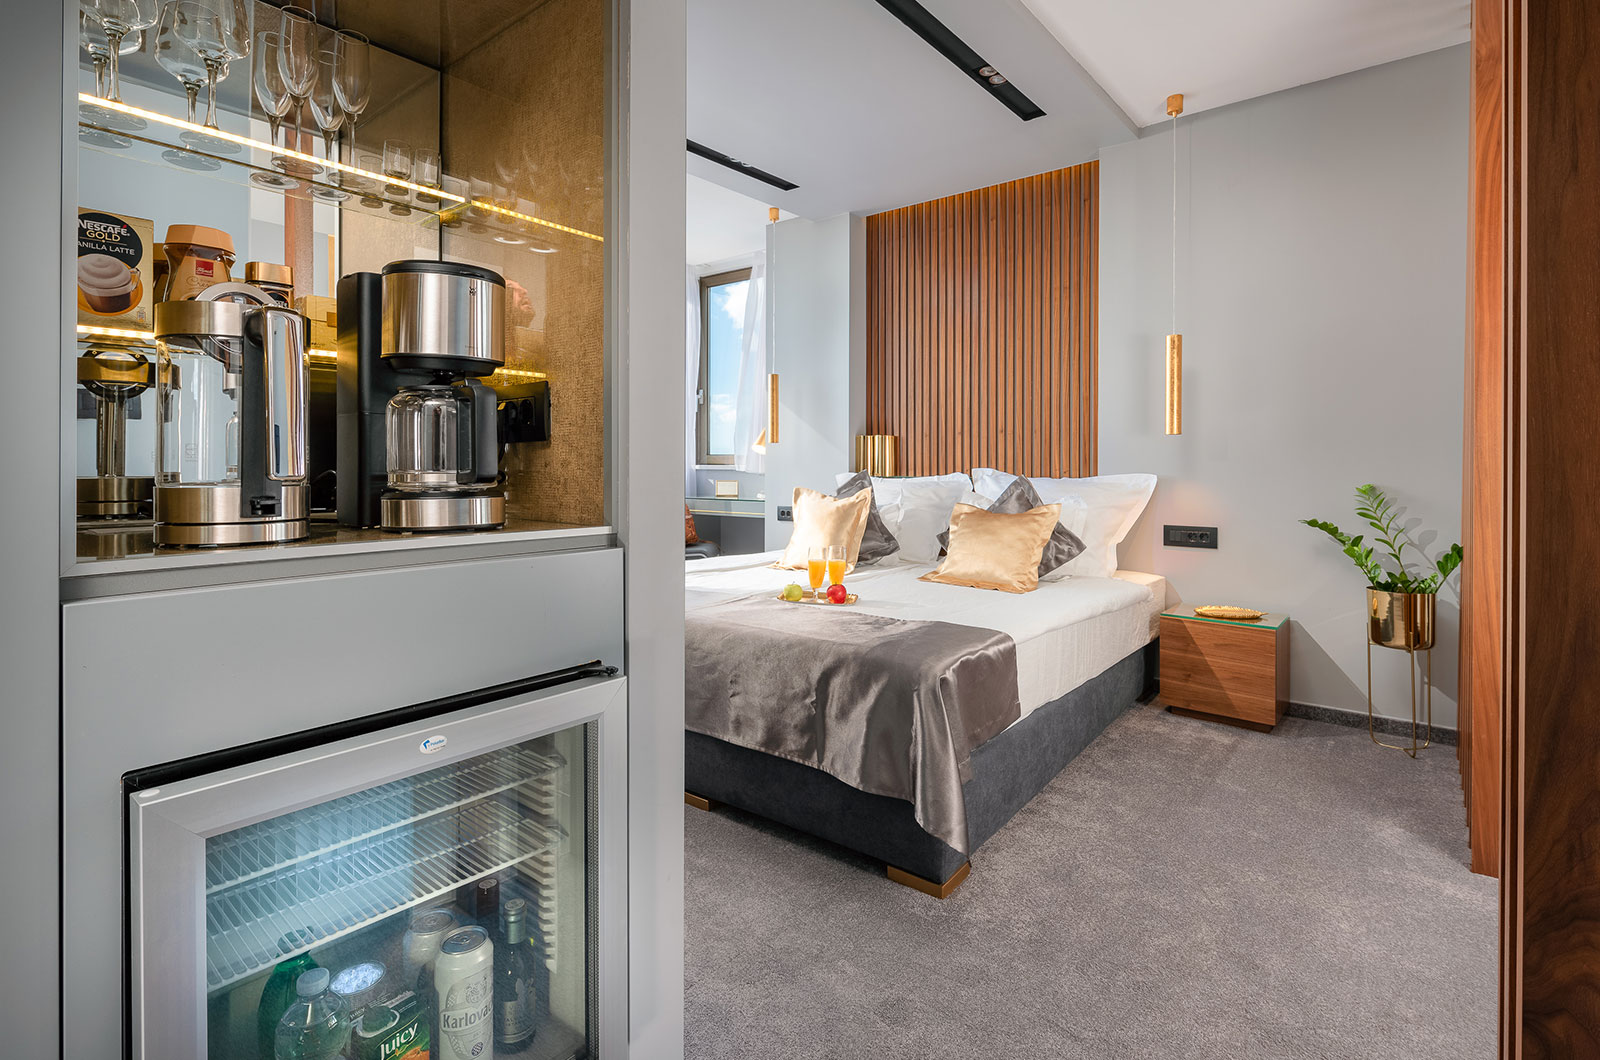 seo.title.accommodation.sky.studio.suite